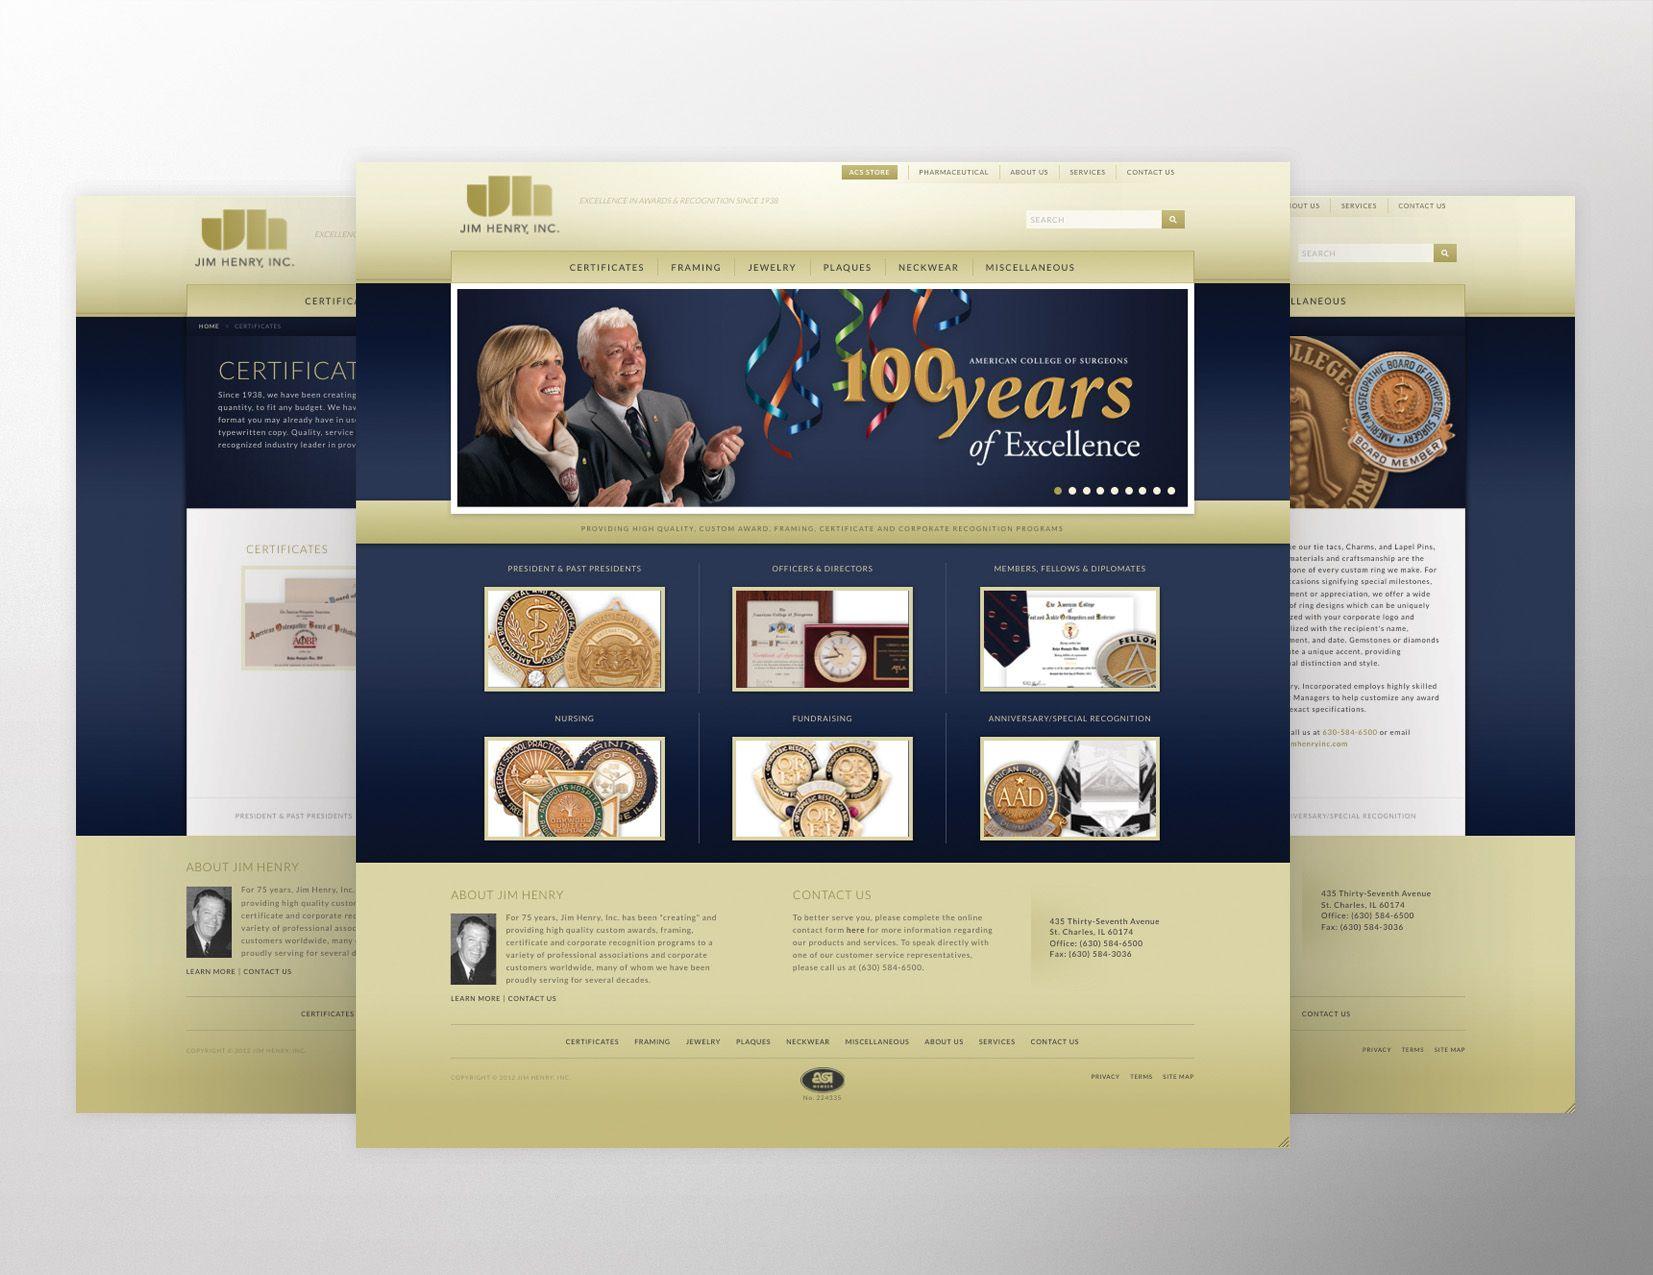 Jim Henry Inc. Website  ||  Streng Design & Advertising #ResponsiveDesign #WebDesign #WebDevelopment #UIdesign #InterfaceDesign #umbraco